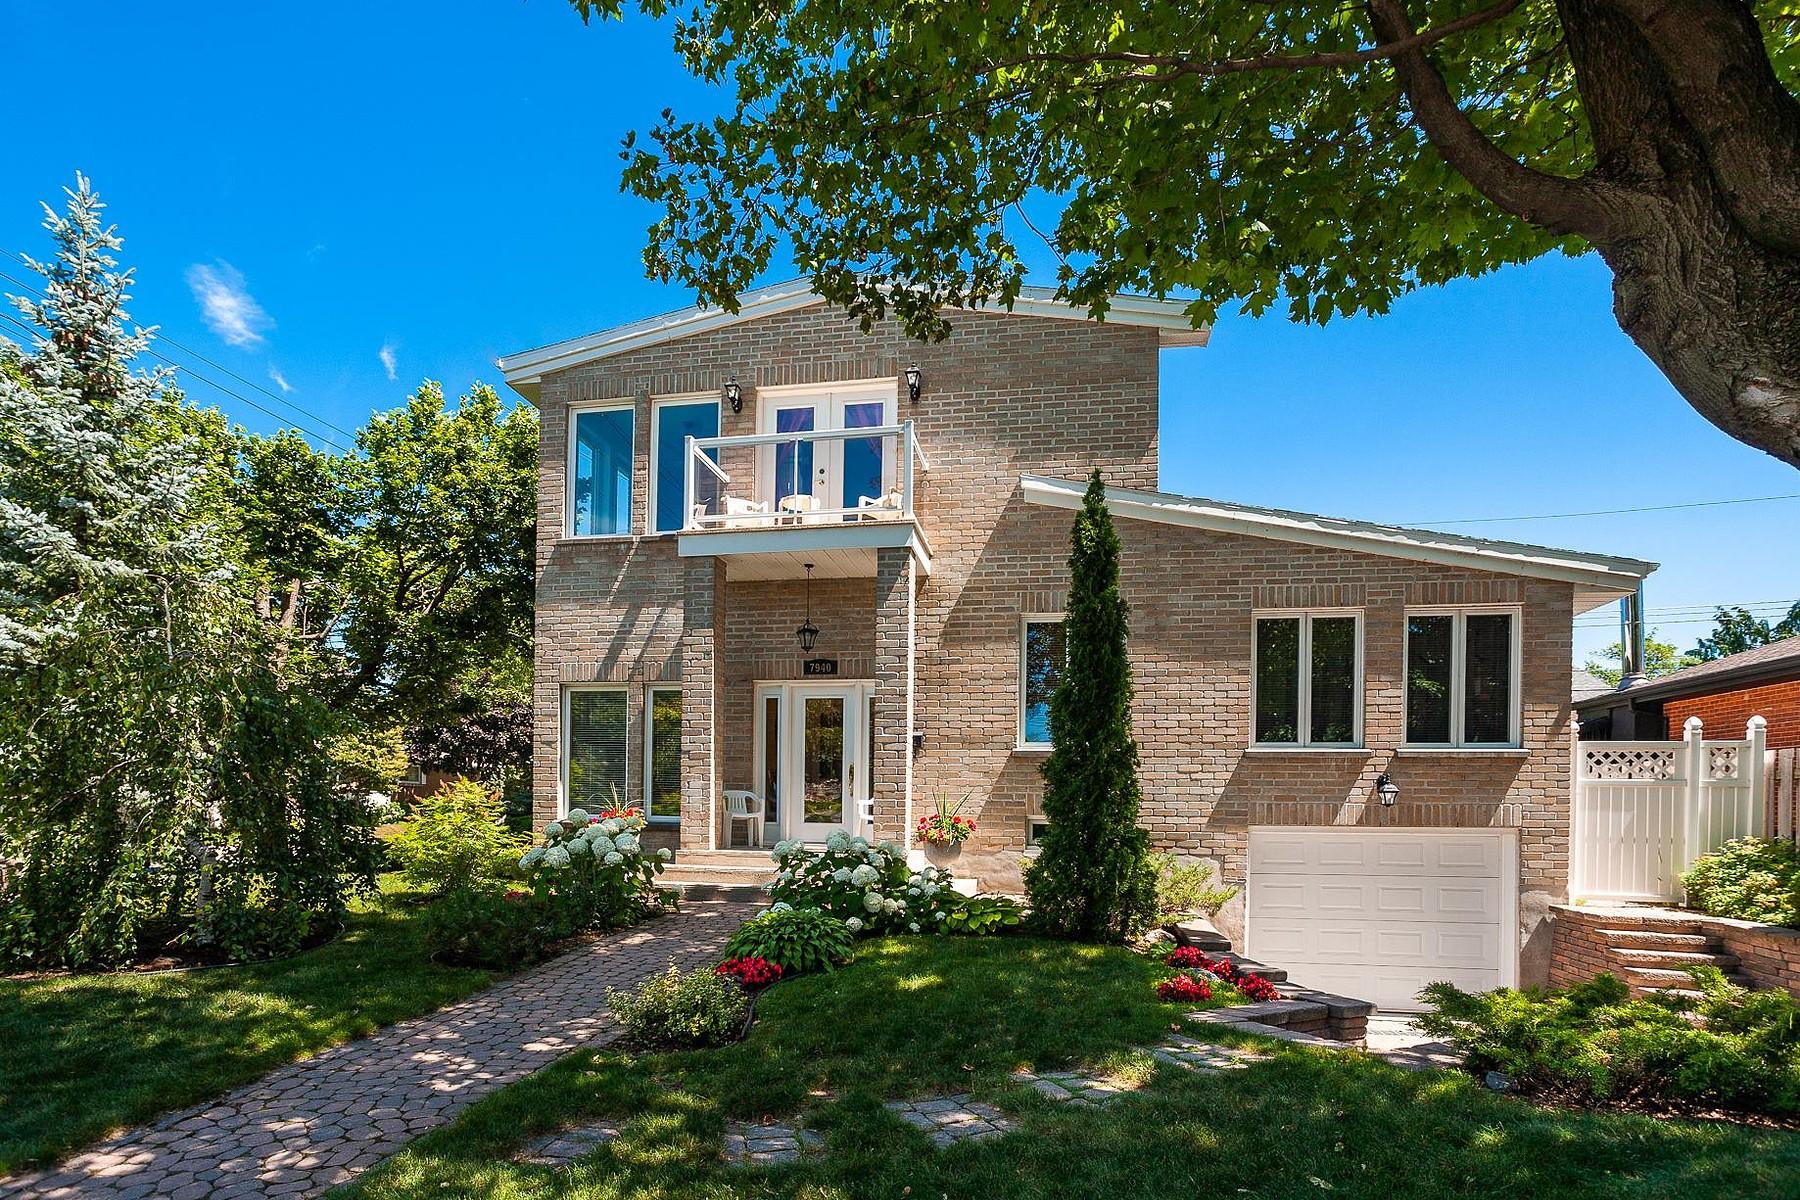 Single Family Homes for Sale at Anjou, Montréal 7940 Av. des Vendéens Anjou, Quebec H1K1S8 Canada